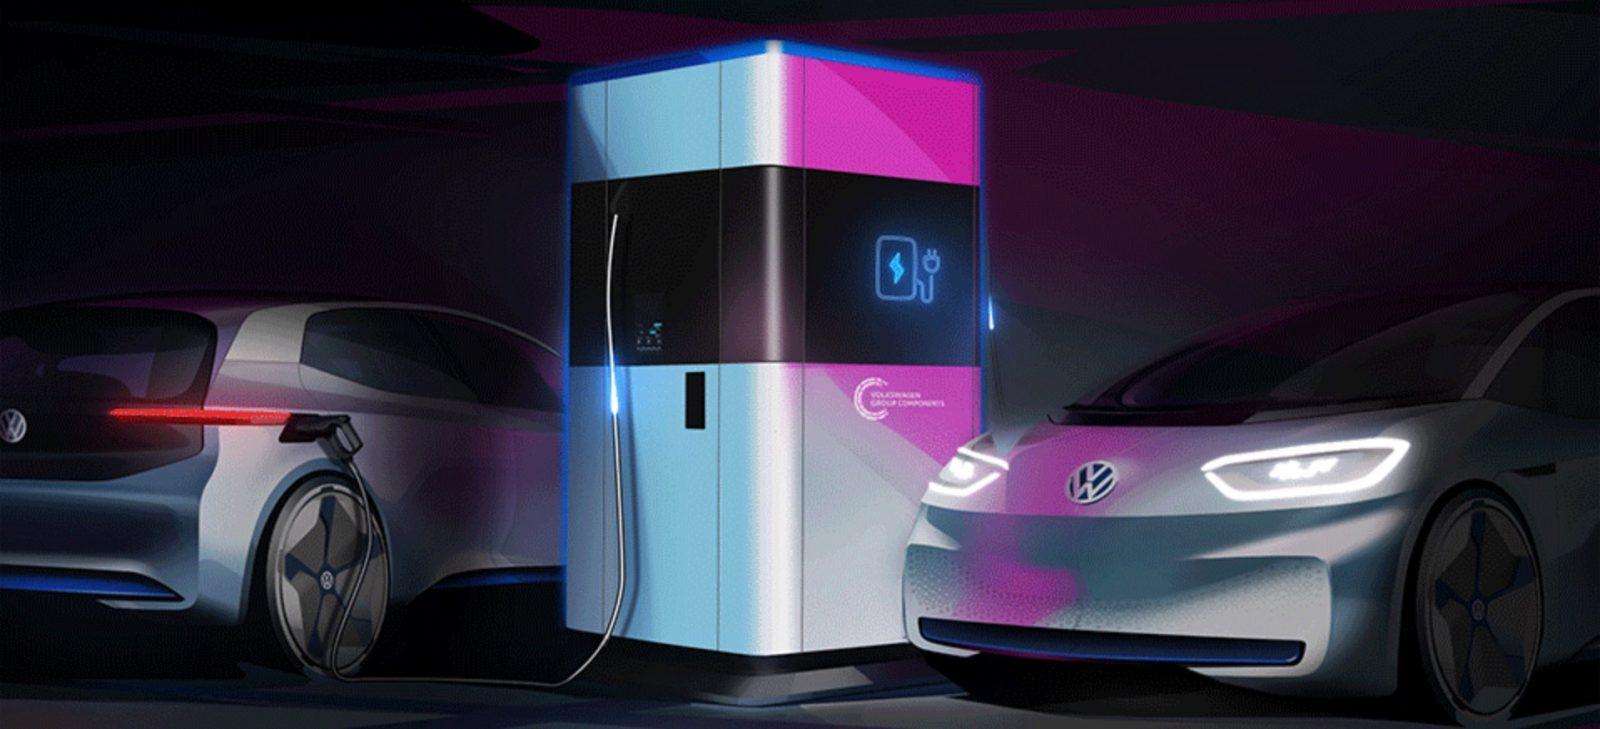 Volkswagen najavljuje prvi mobilni električni punjač za automobile!